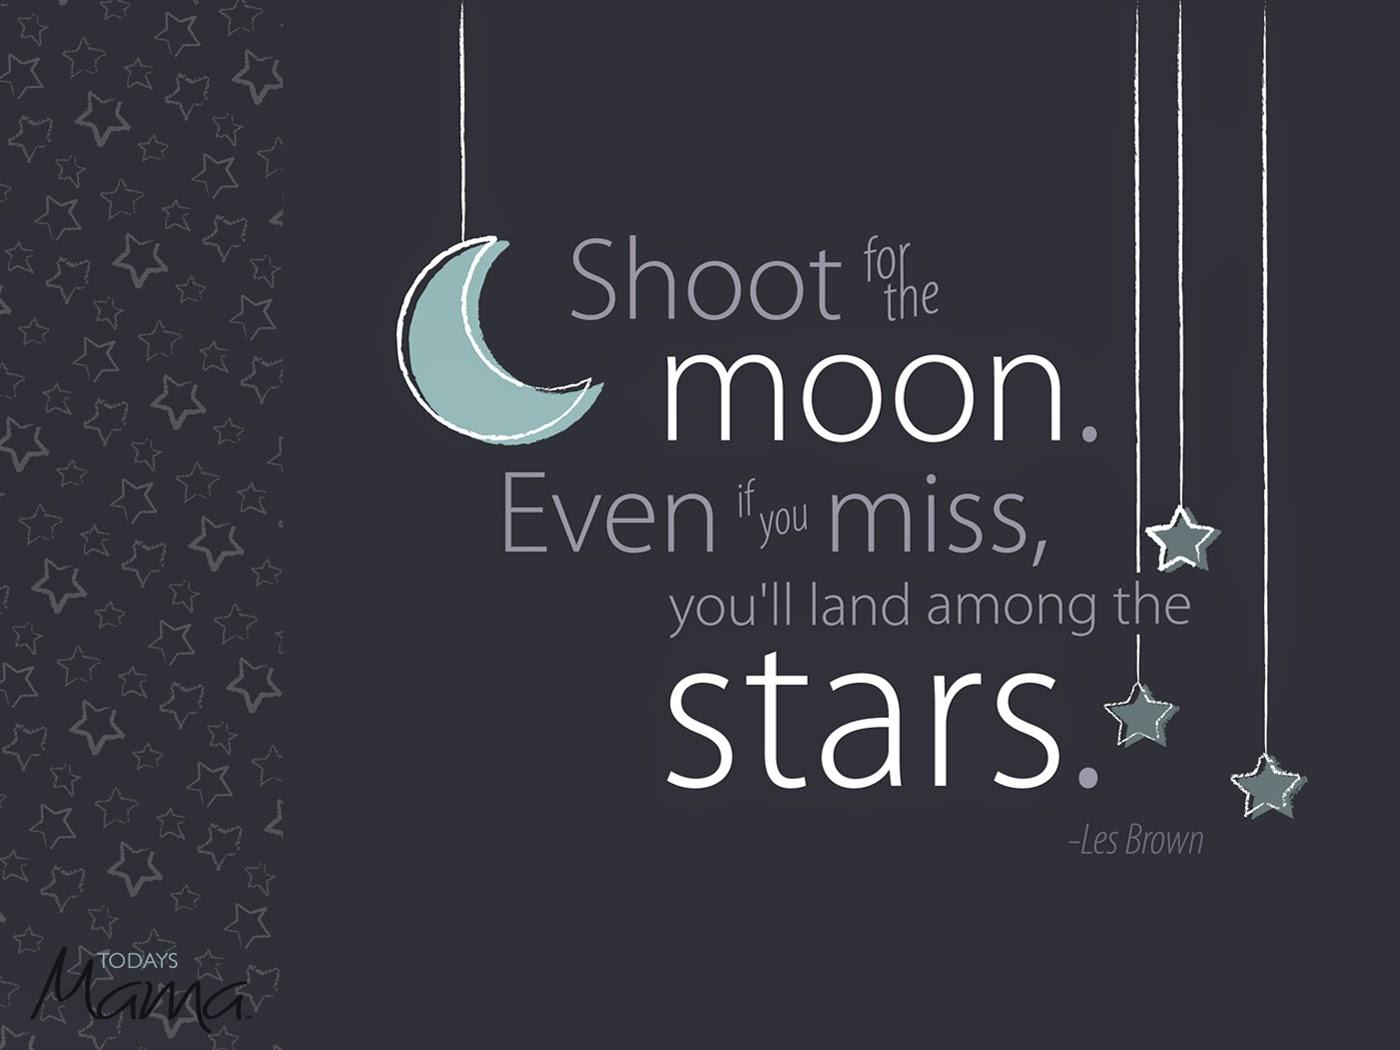 Best Uplifting Quotes: Short Amazing Inspirational Quotes